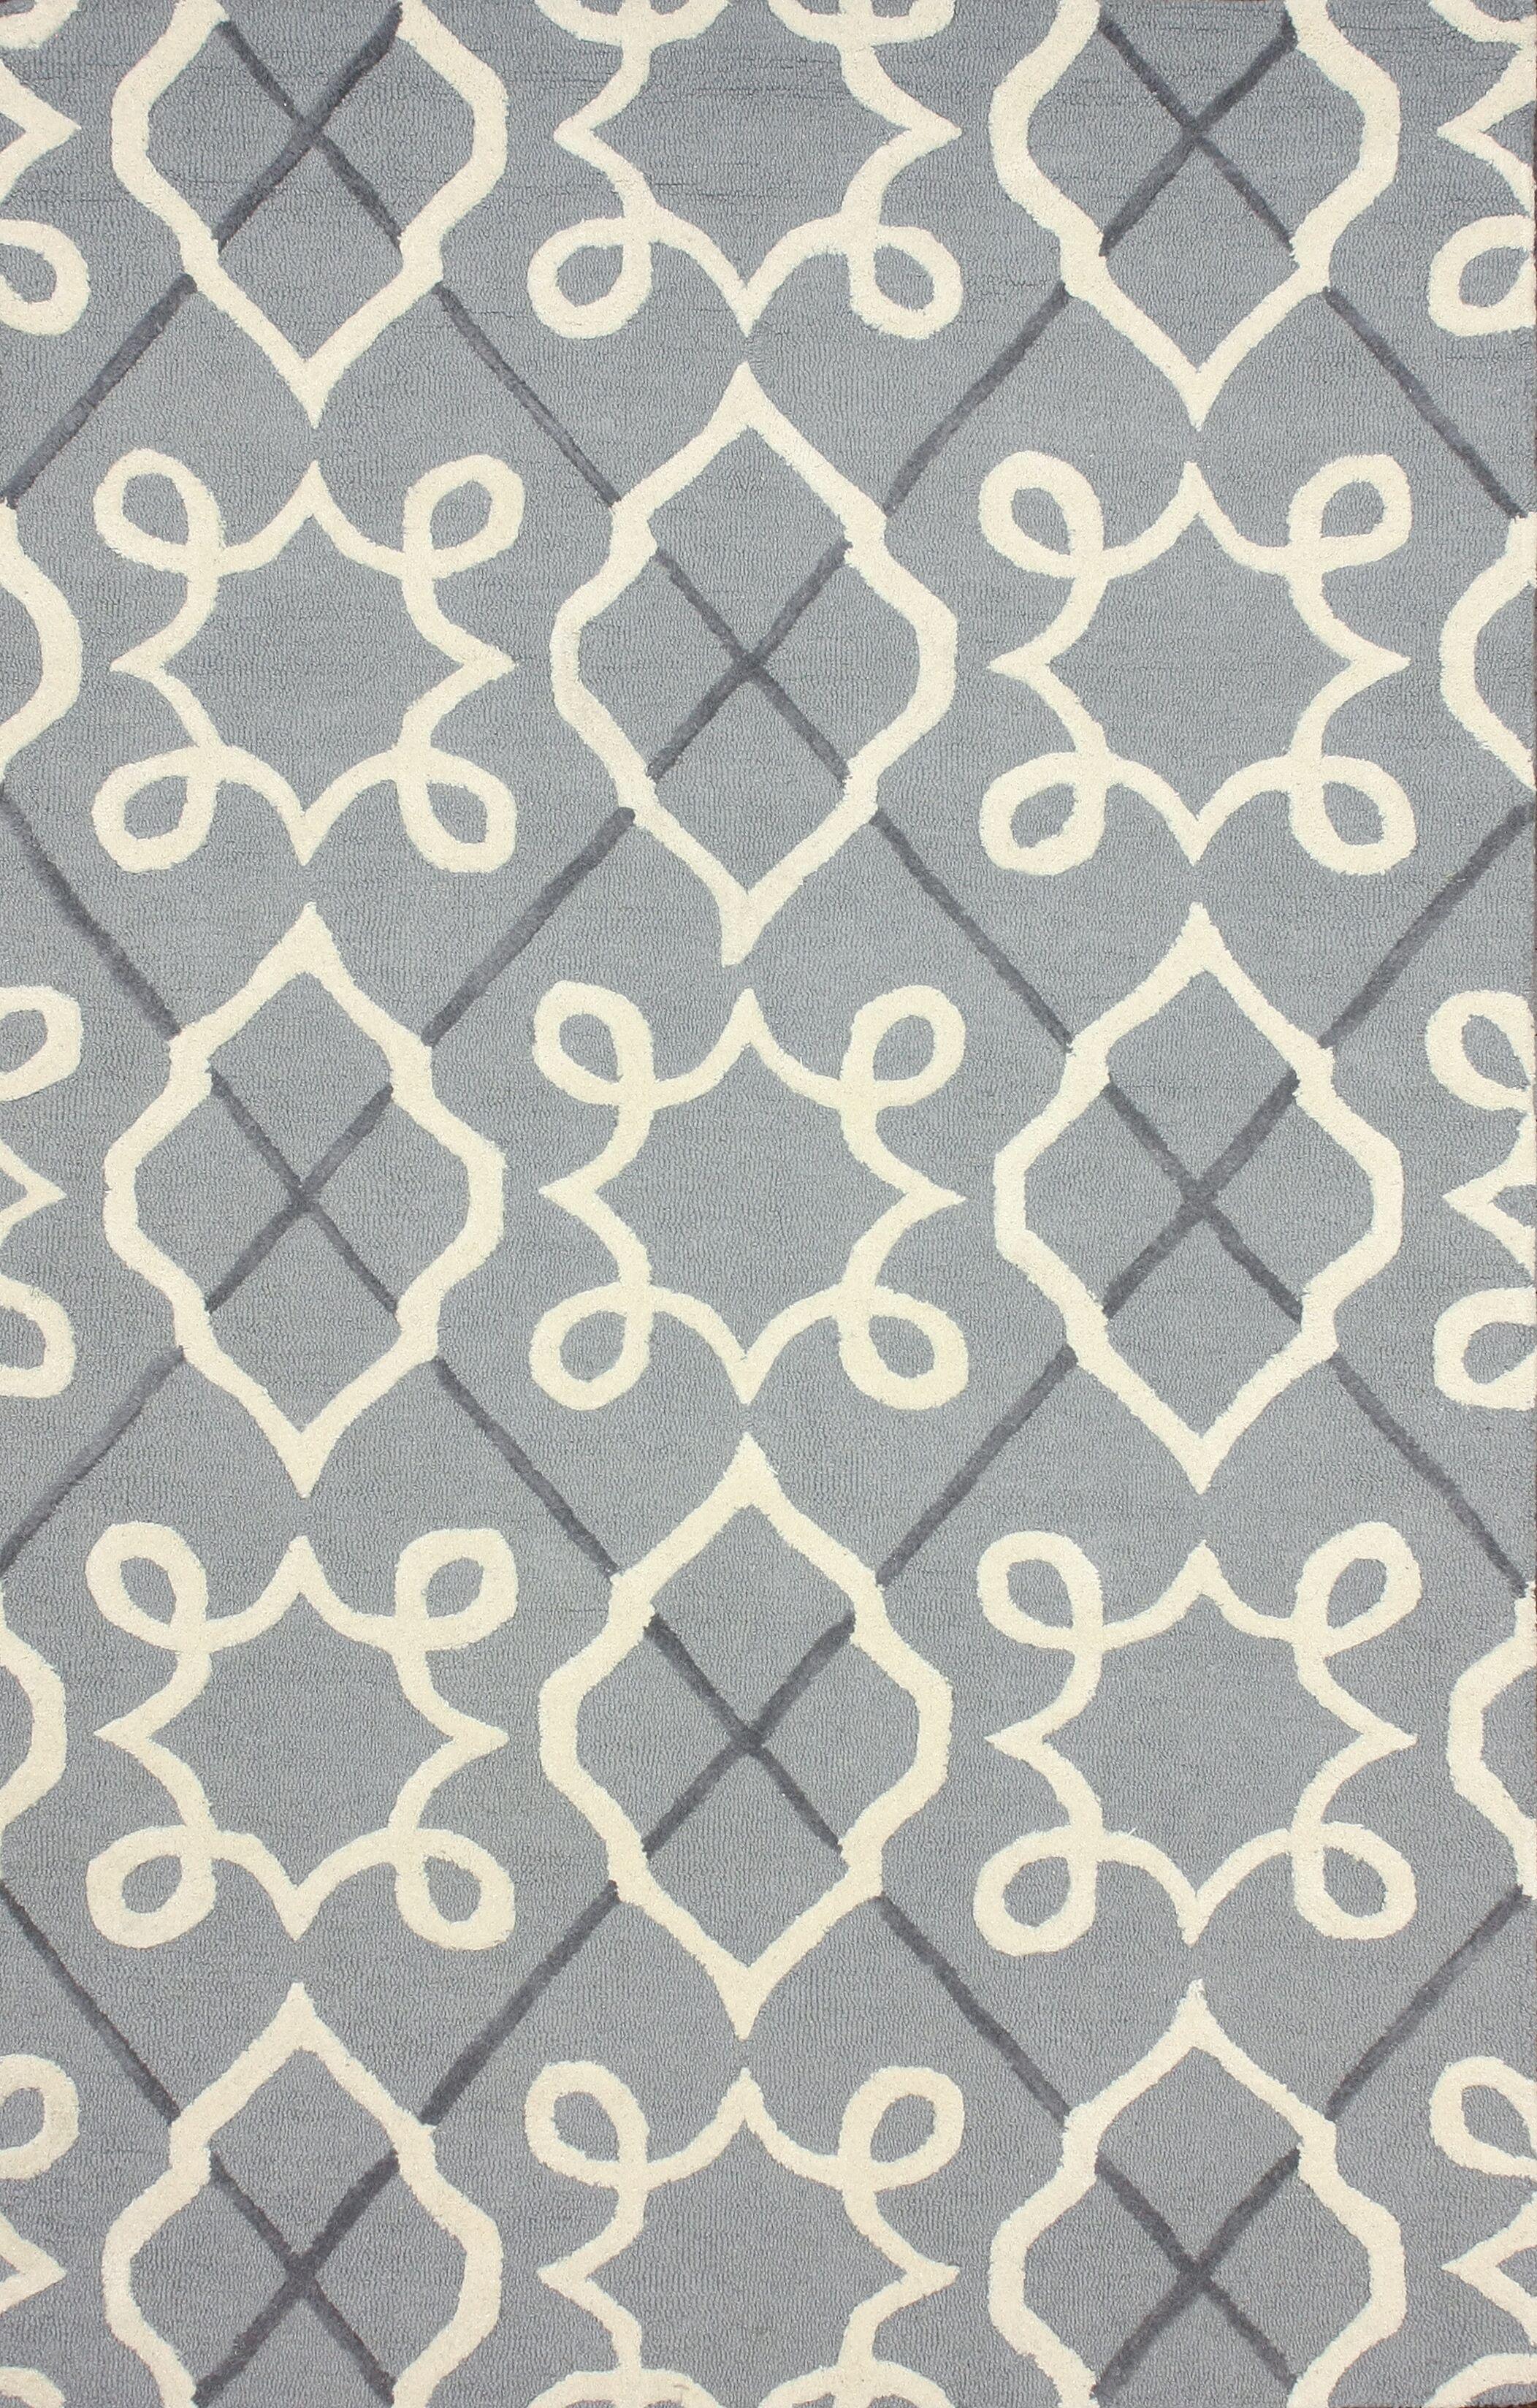 Varanas Hand-Tufted Wool Gray Area Rug Rug Size: Rectangle 8' 6